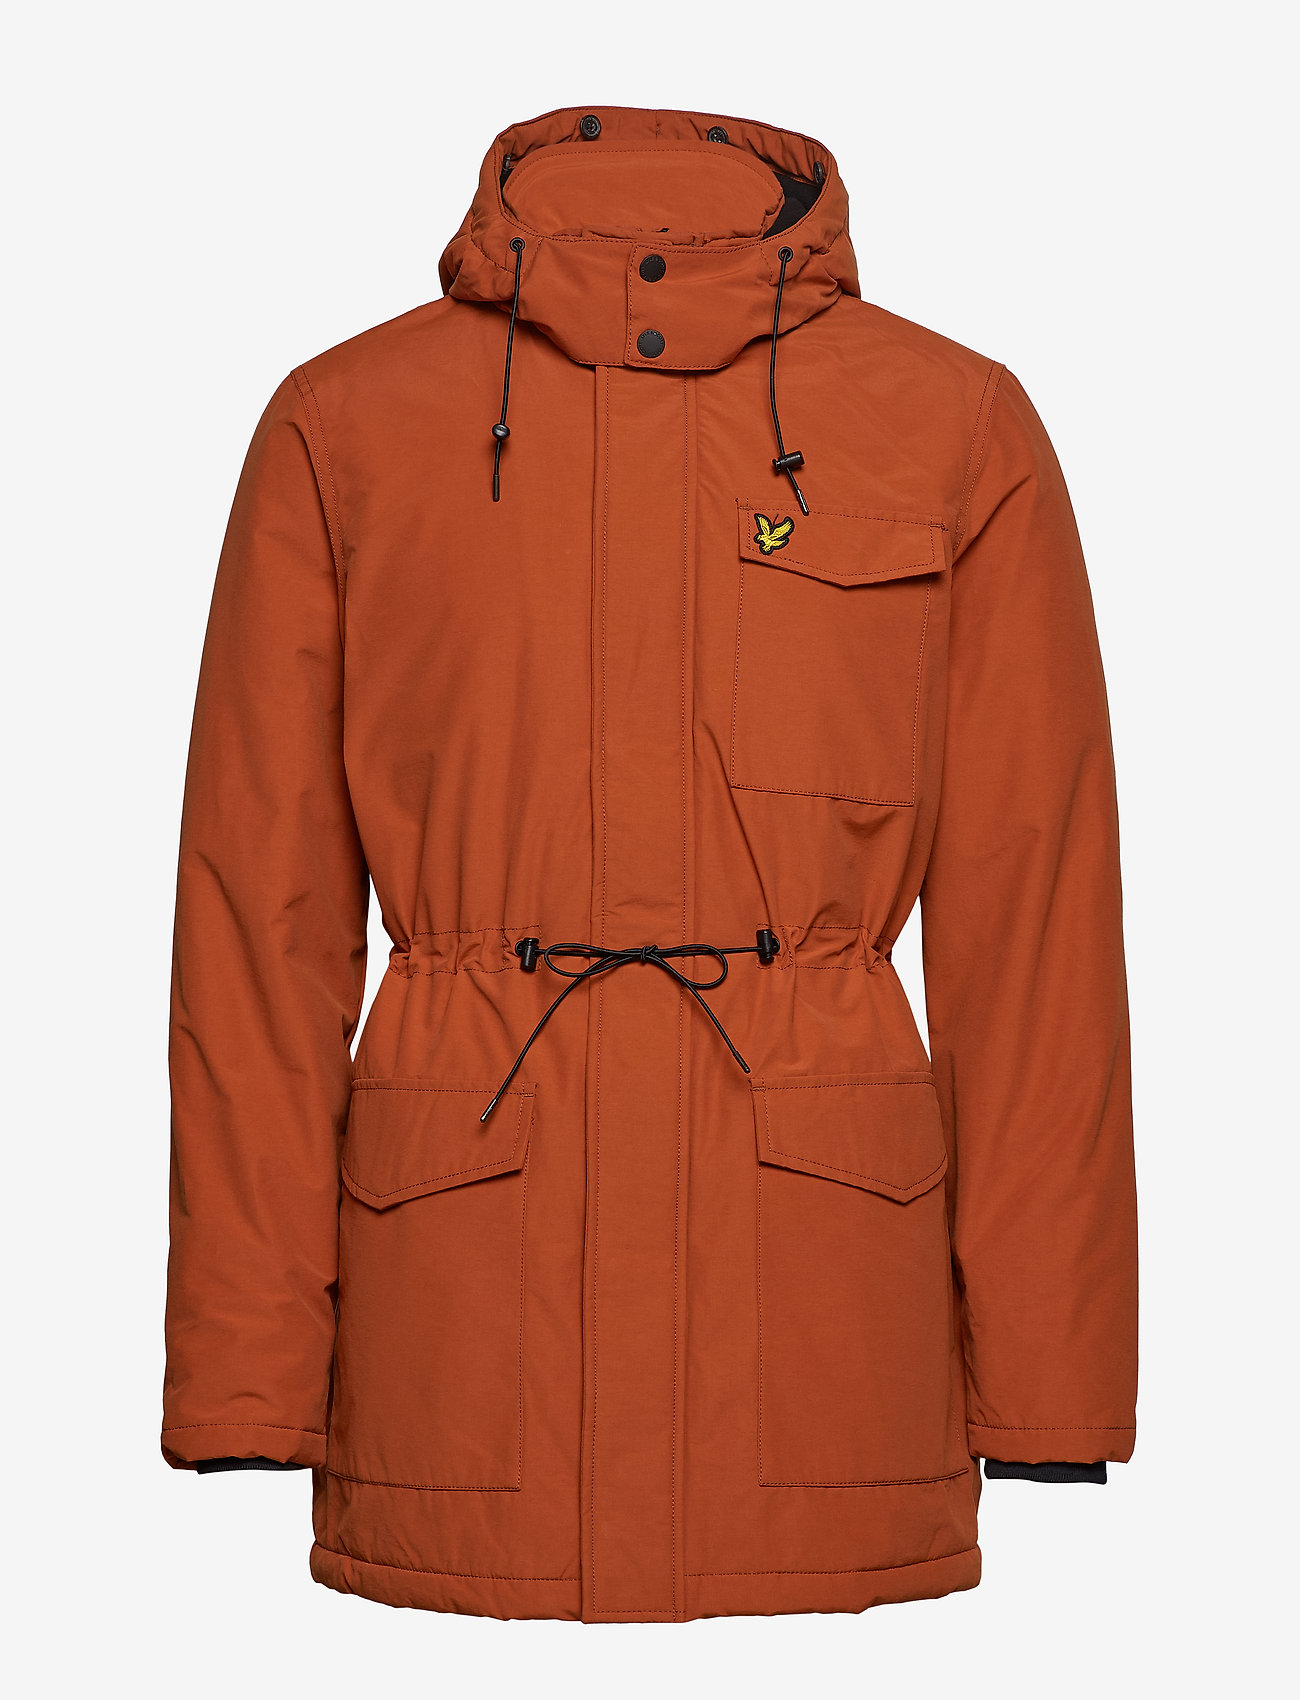 Lyle & Scott Winter Weight Microfleece Jacket - Jakker og frakker TOBACCO - Menn Klær